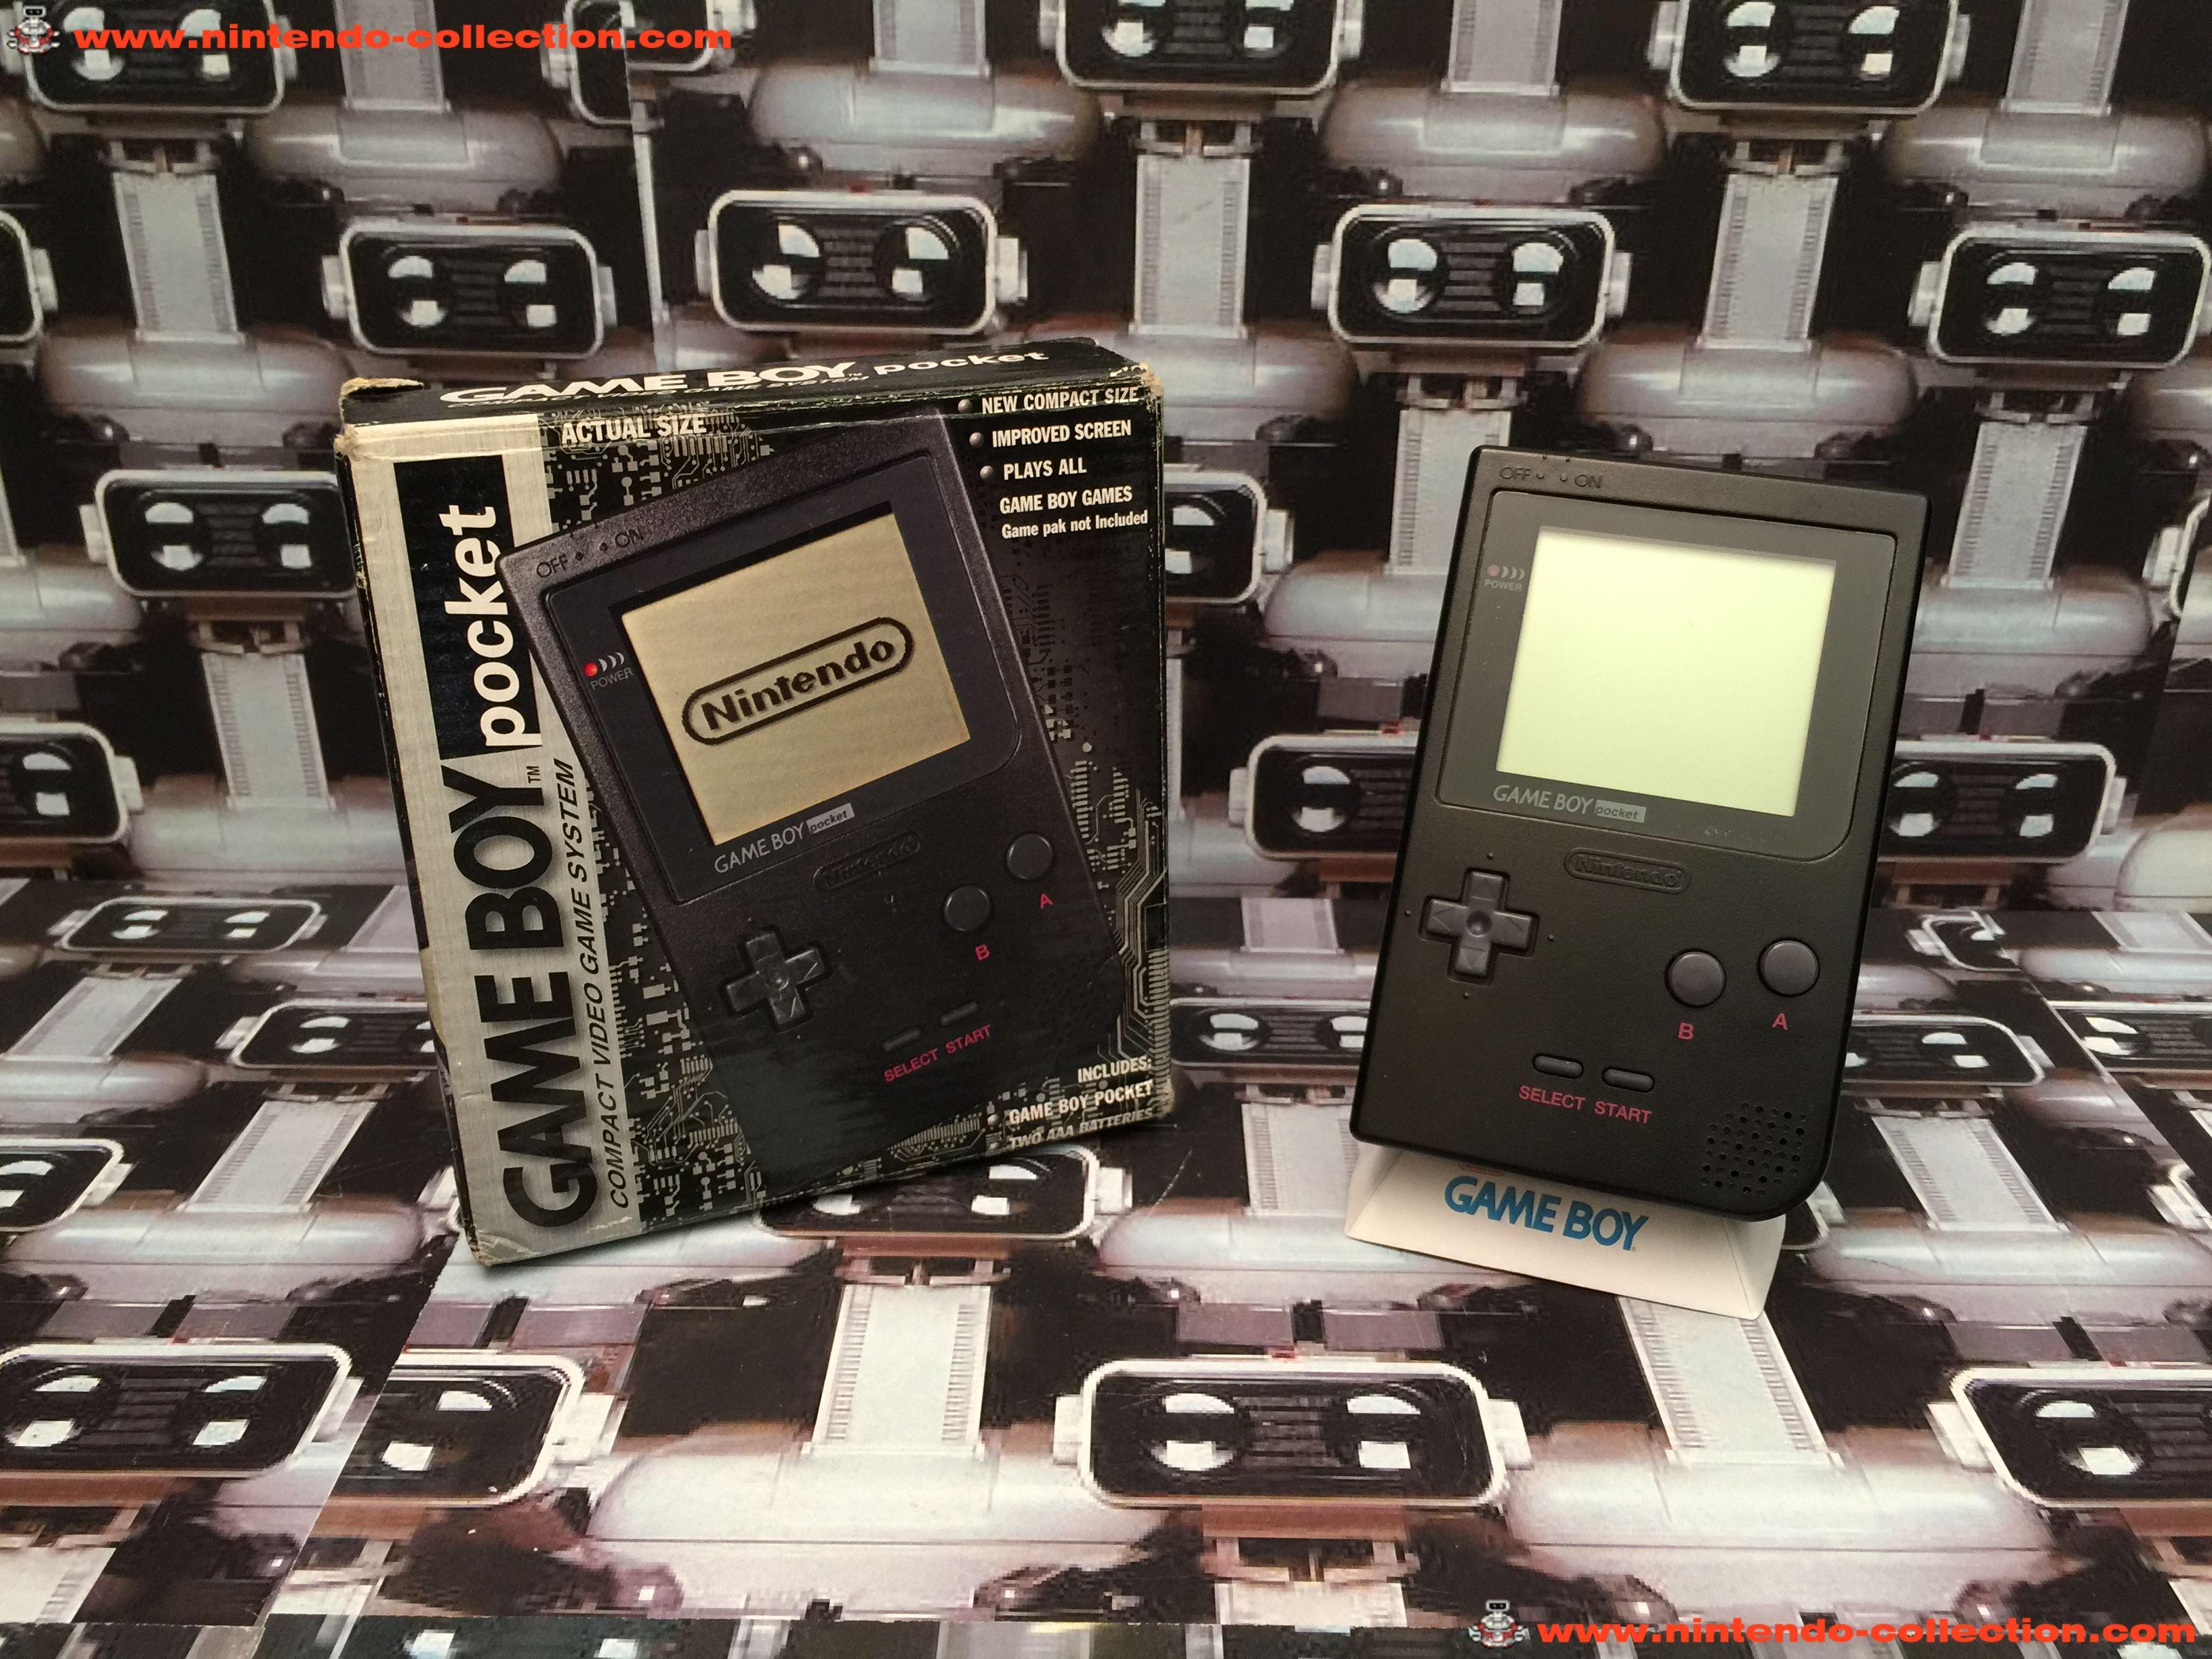 www.nintendo-collection.com - Gameboy GB Pocket Black Noir en boite in box European Europe